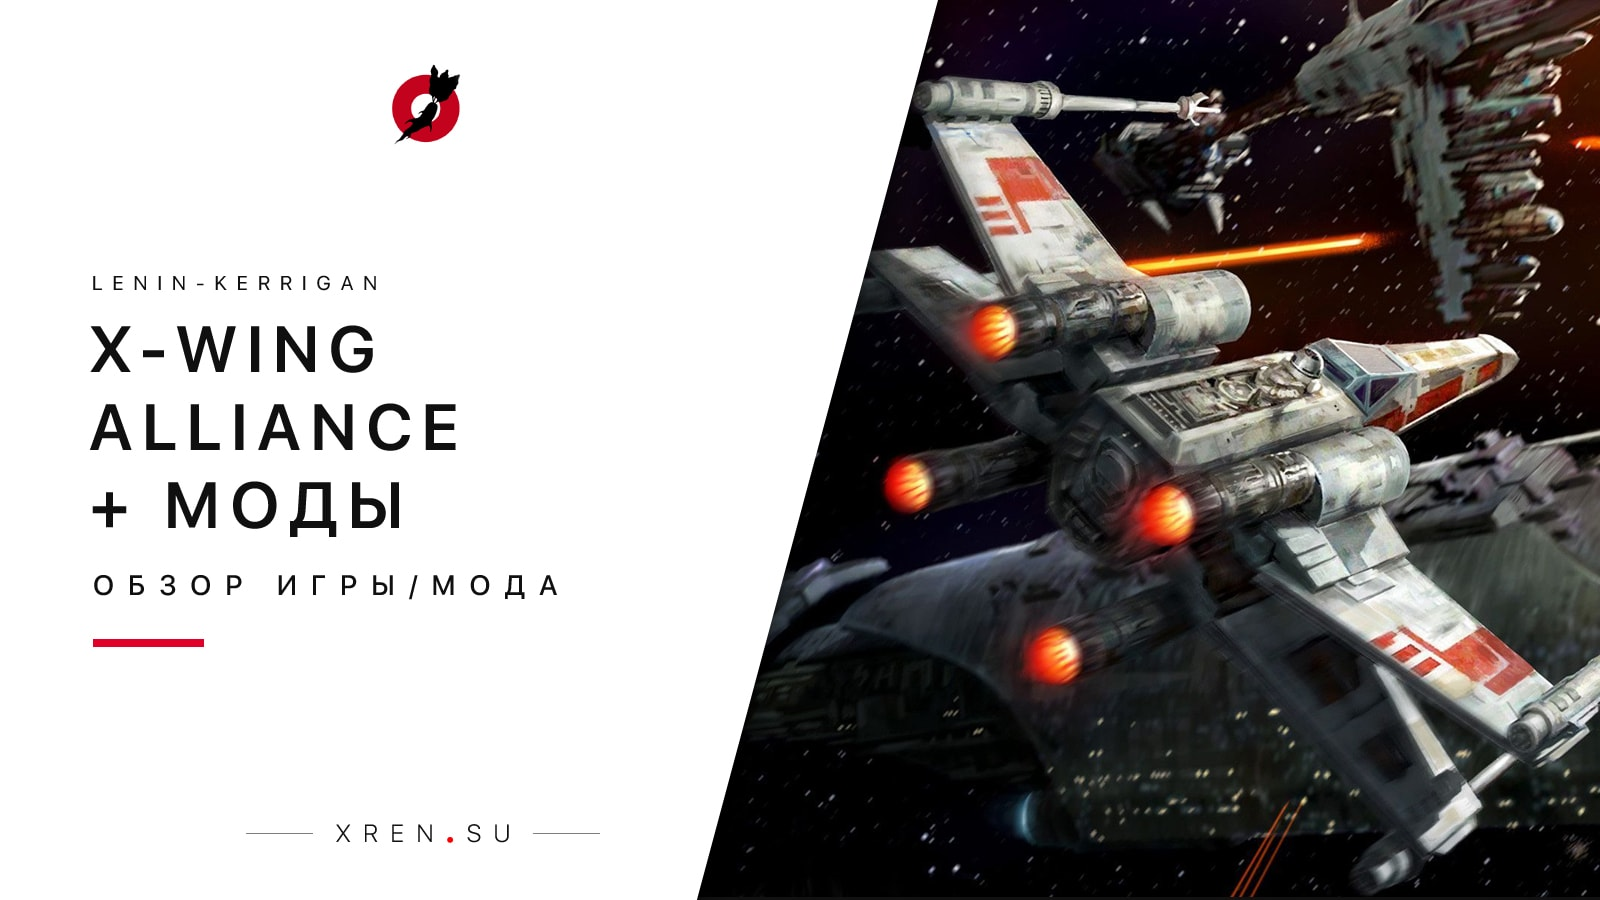 X-Wing Alliance + моды